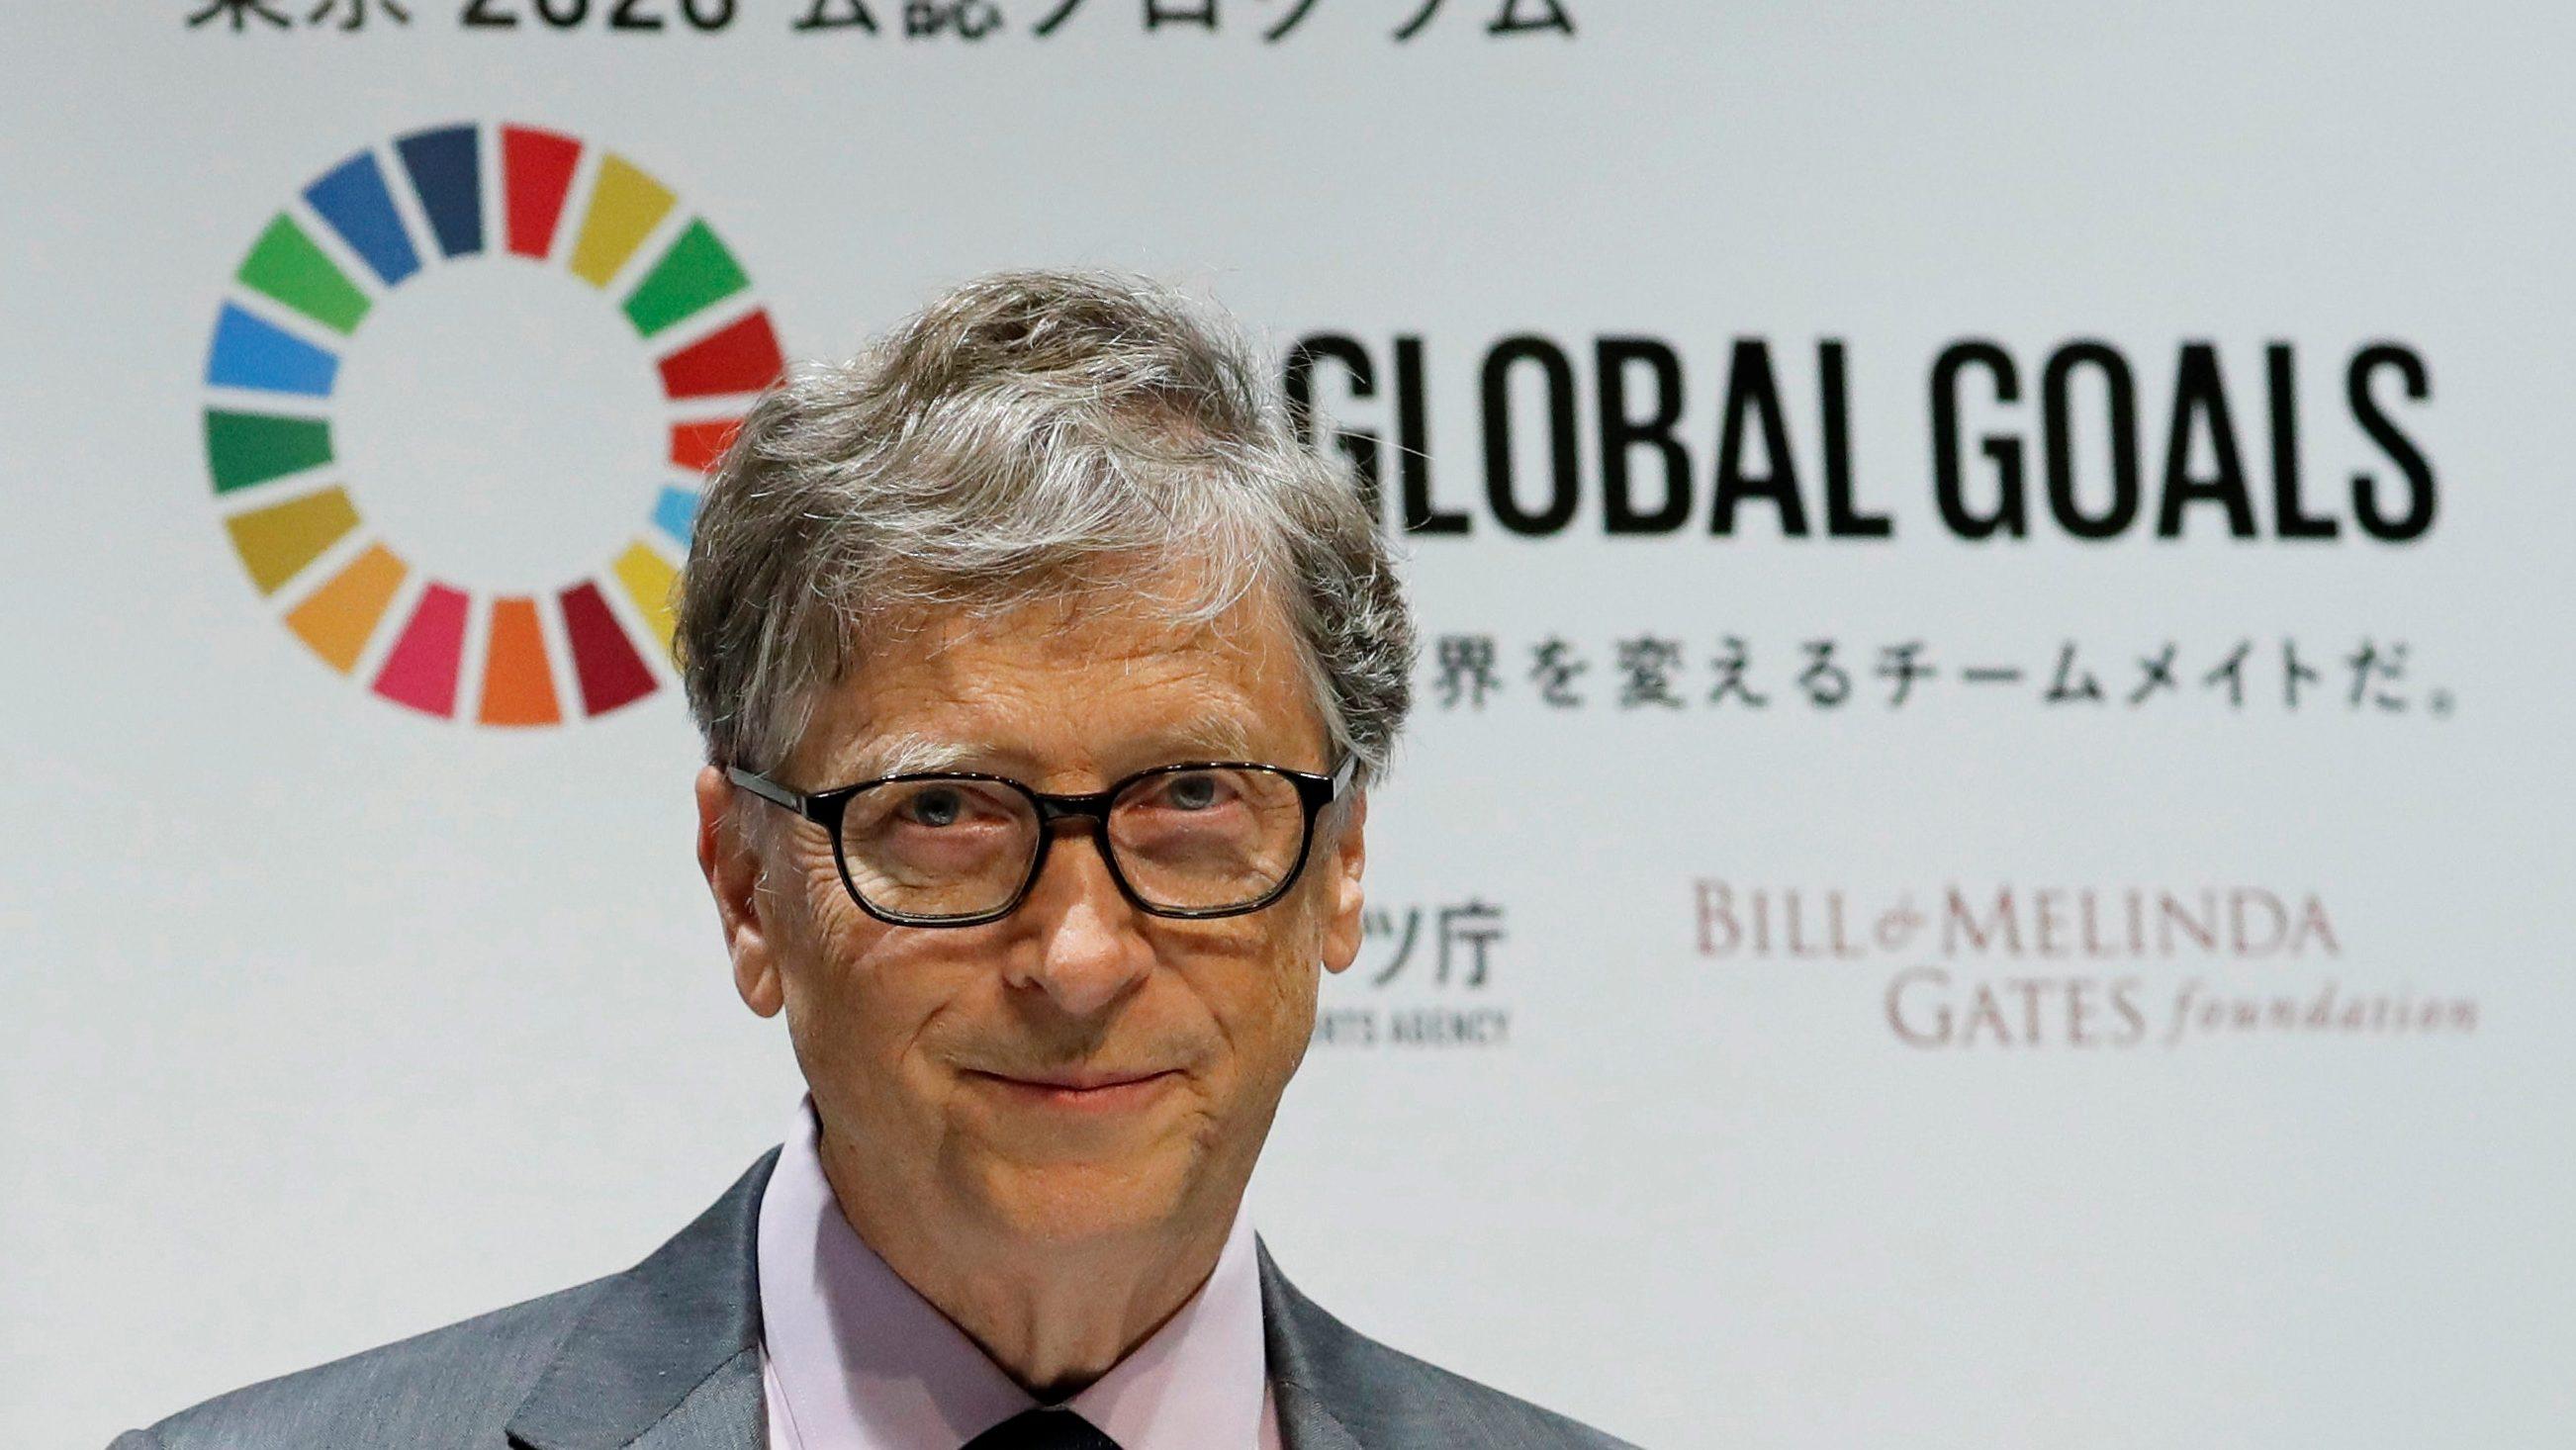 Bill Gates is stepping down from Microsoft's board — Quartz